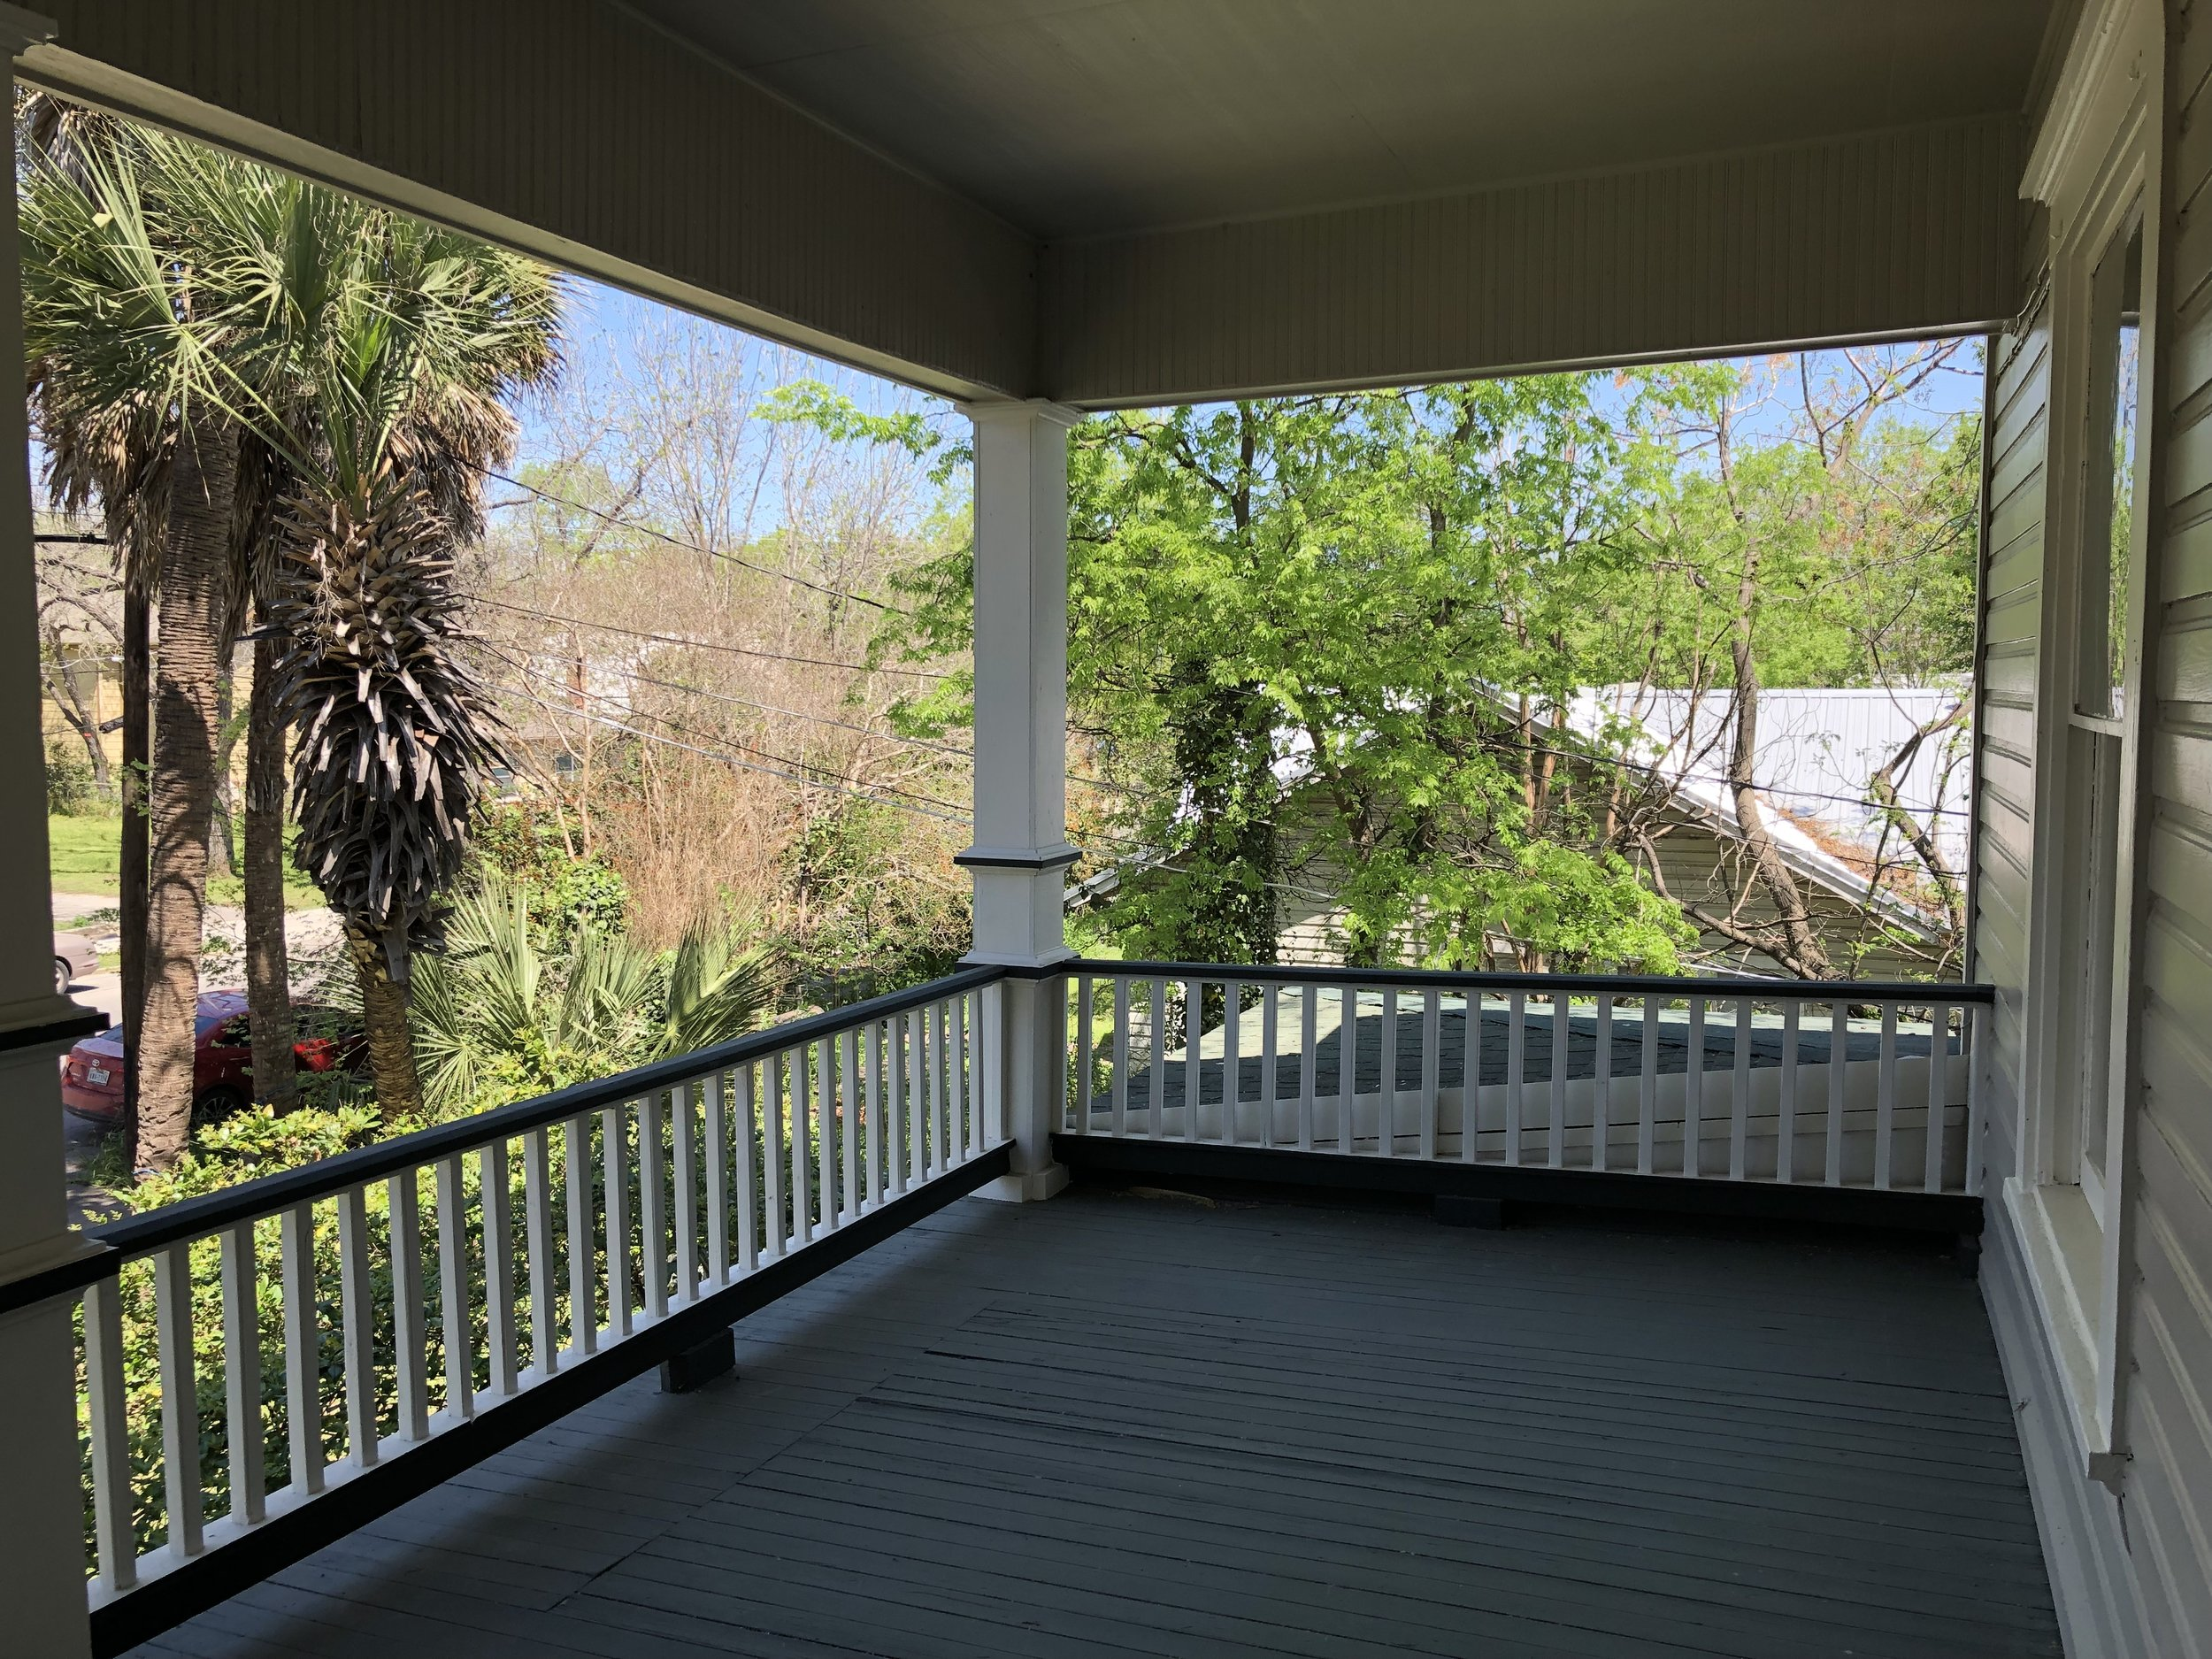 527 WSA balcony Photo Mar 26, 1 15 31 PM (1).jpg